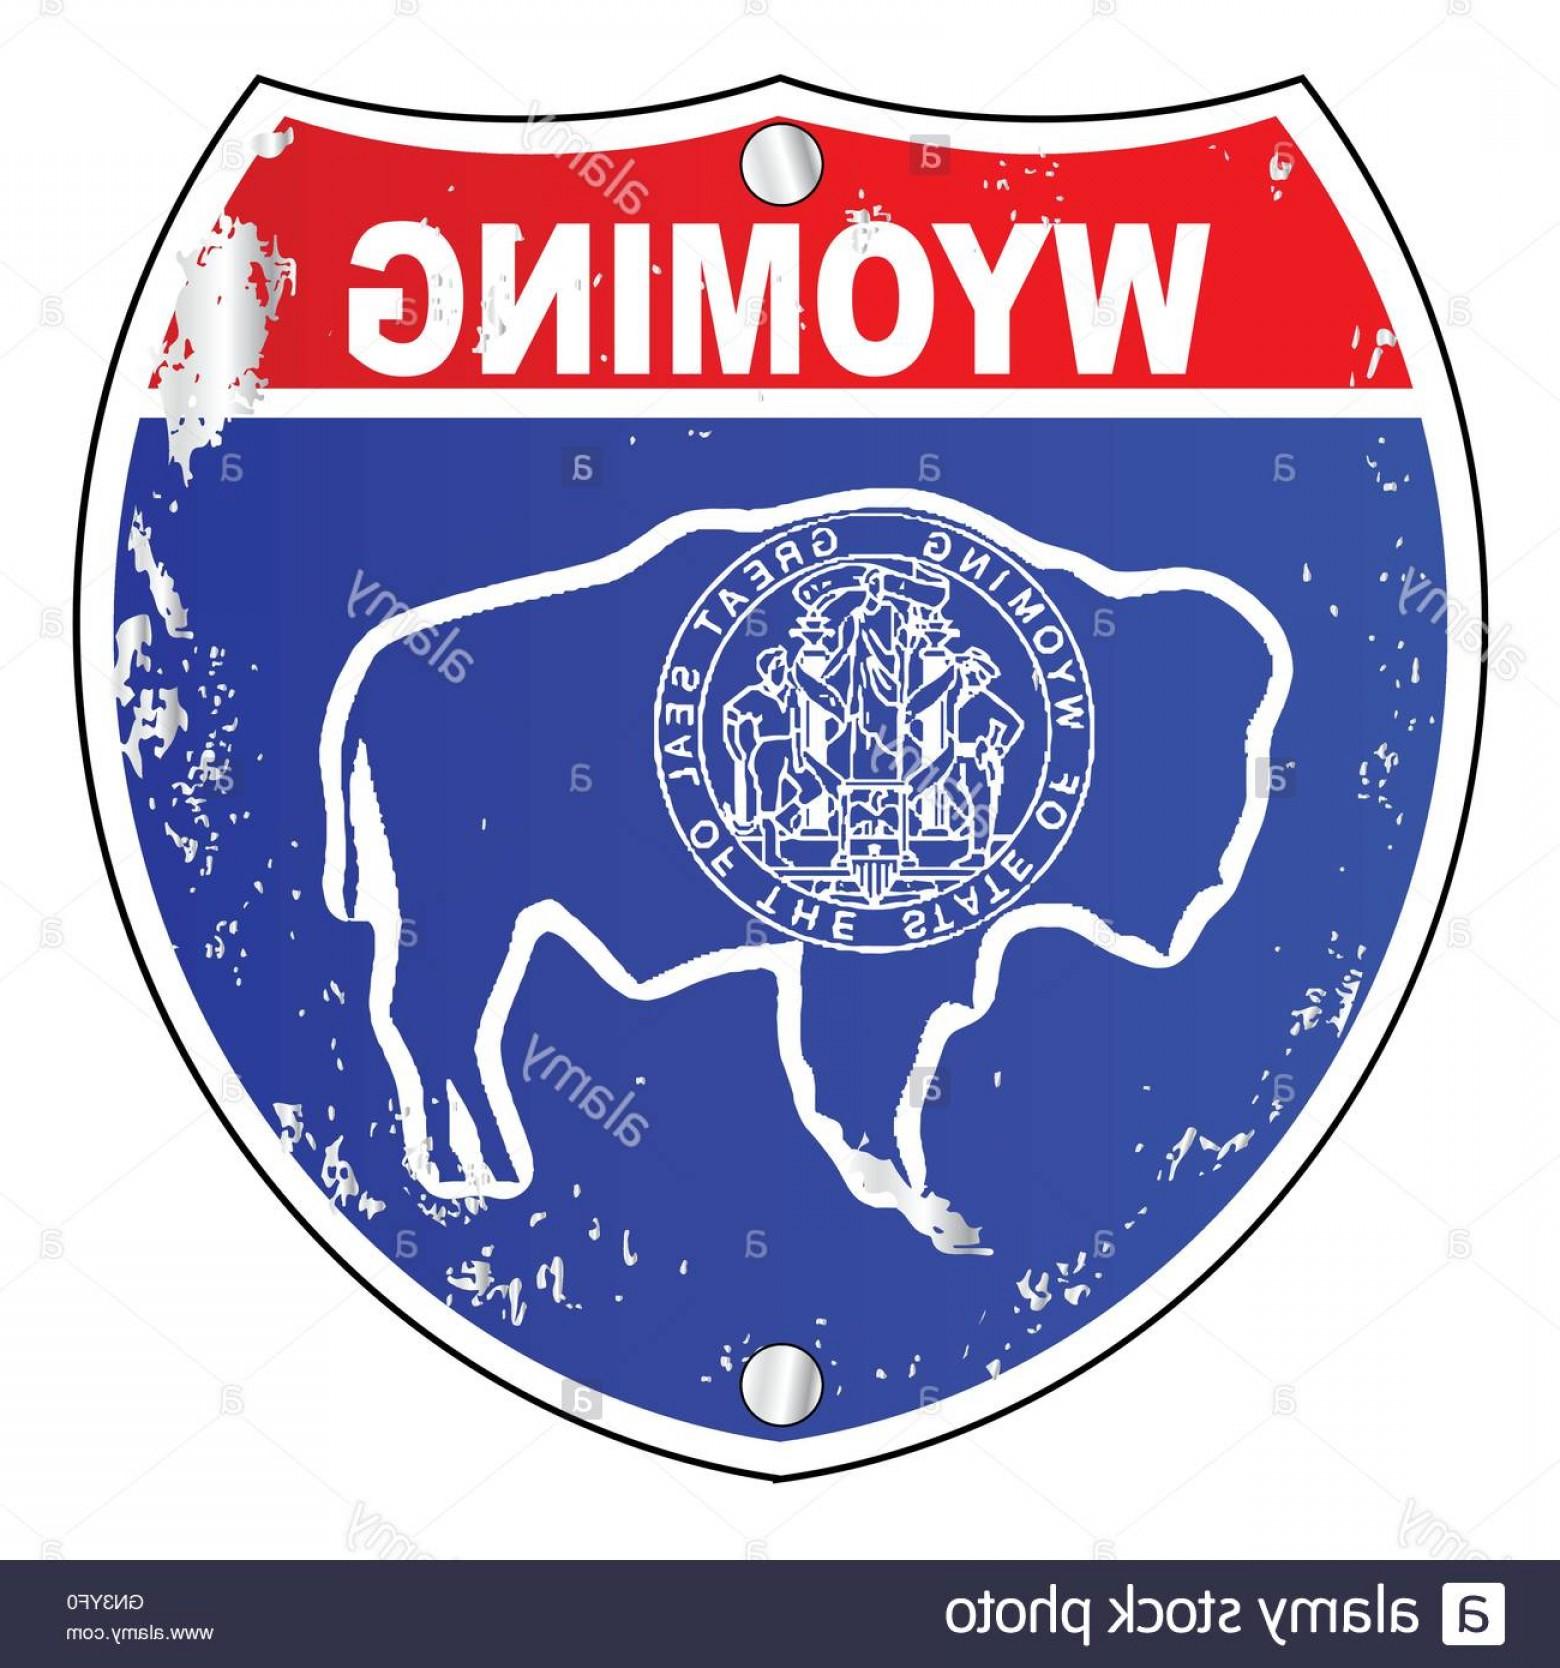 1560x1668 Stock Photo Wyoming Flag Icons As Interstate Sign Orangiausa